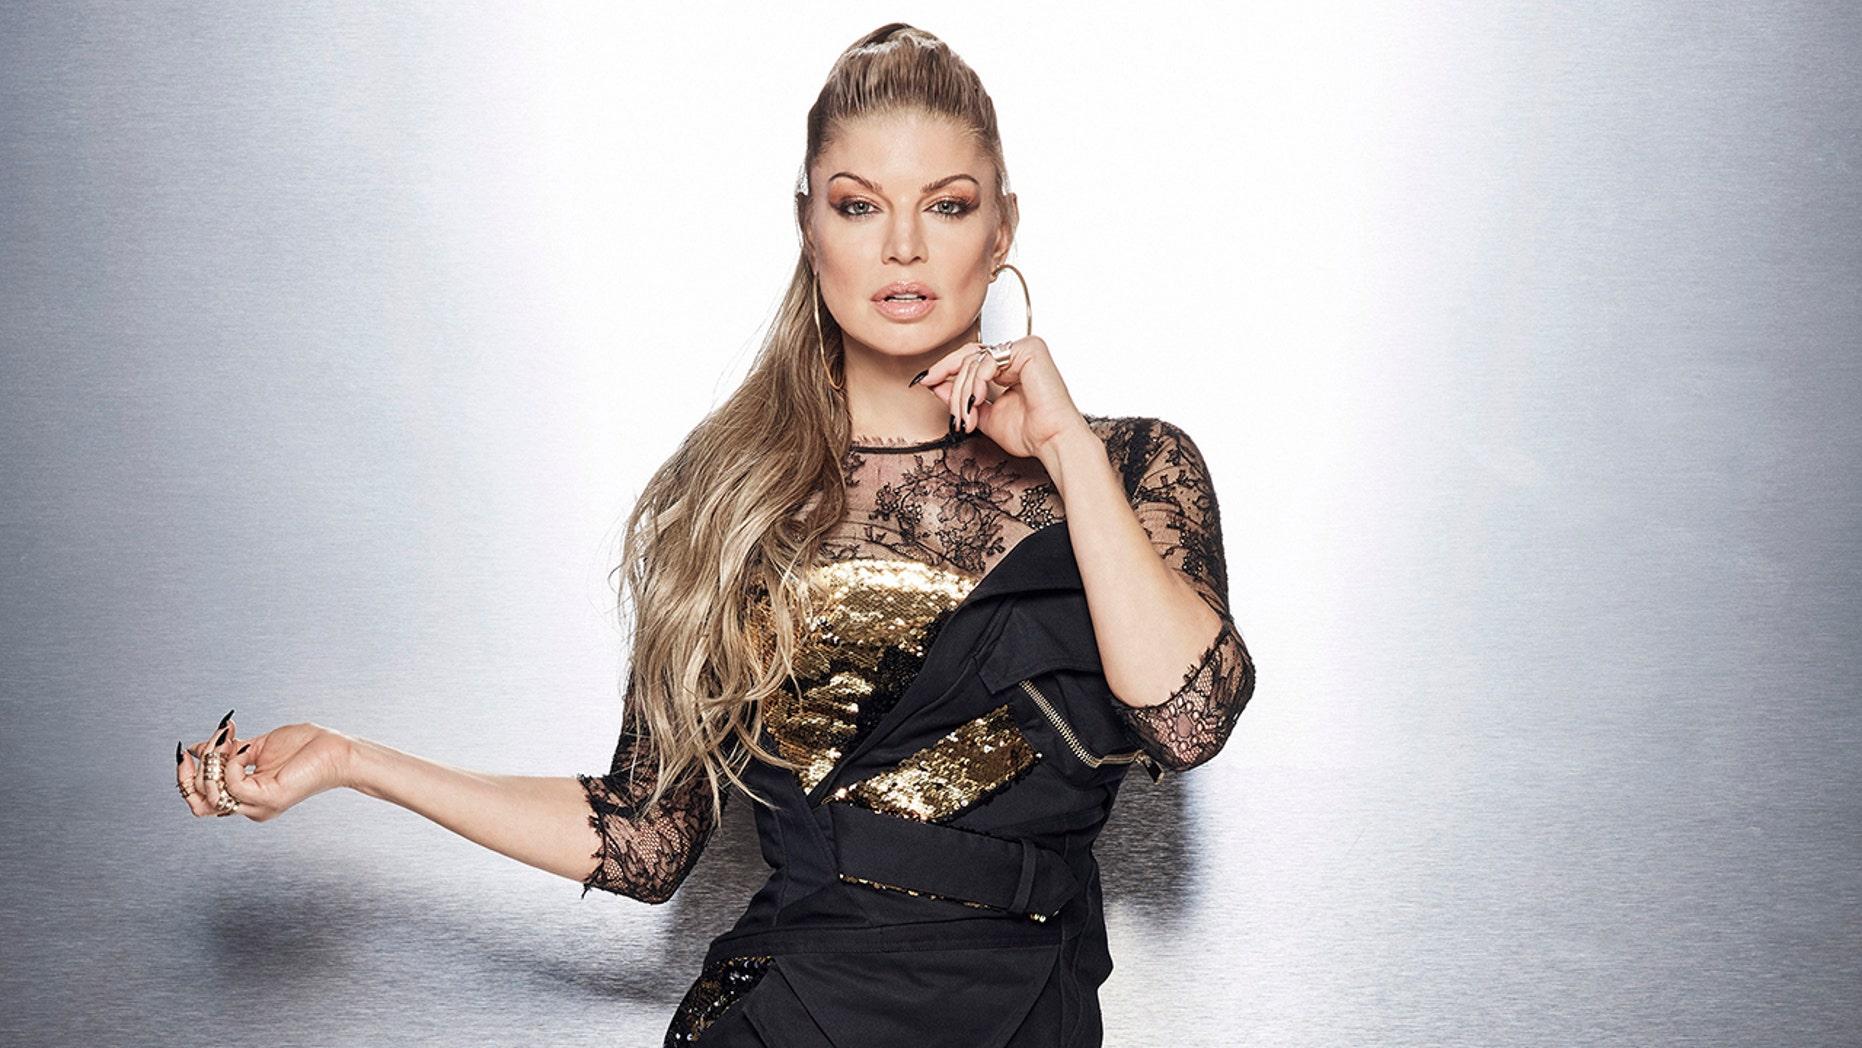 Fergie hosts 'The Four: Battle for Stardom' on Fox on Thursdays.